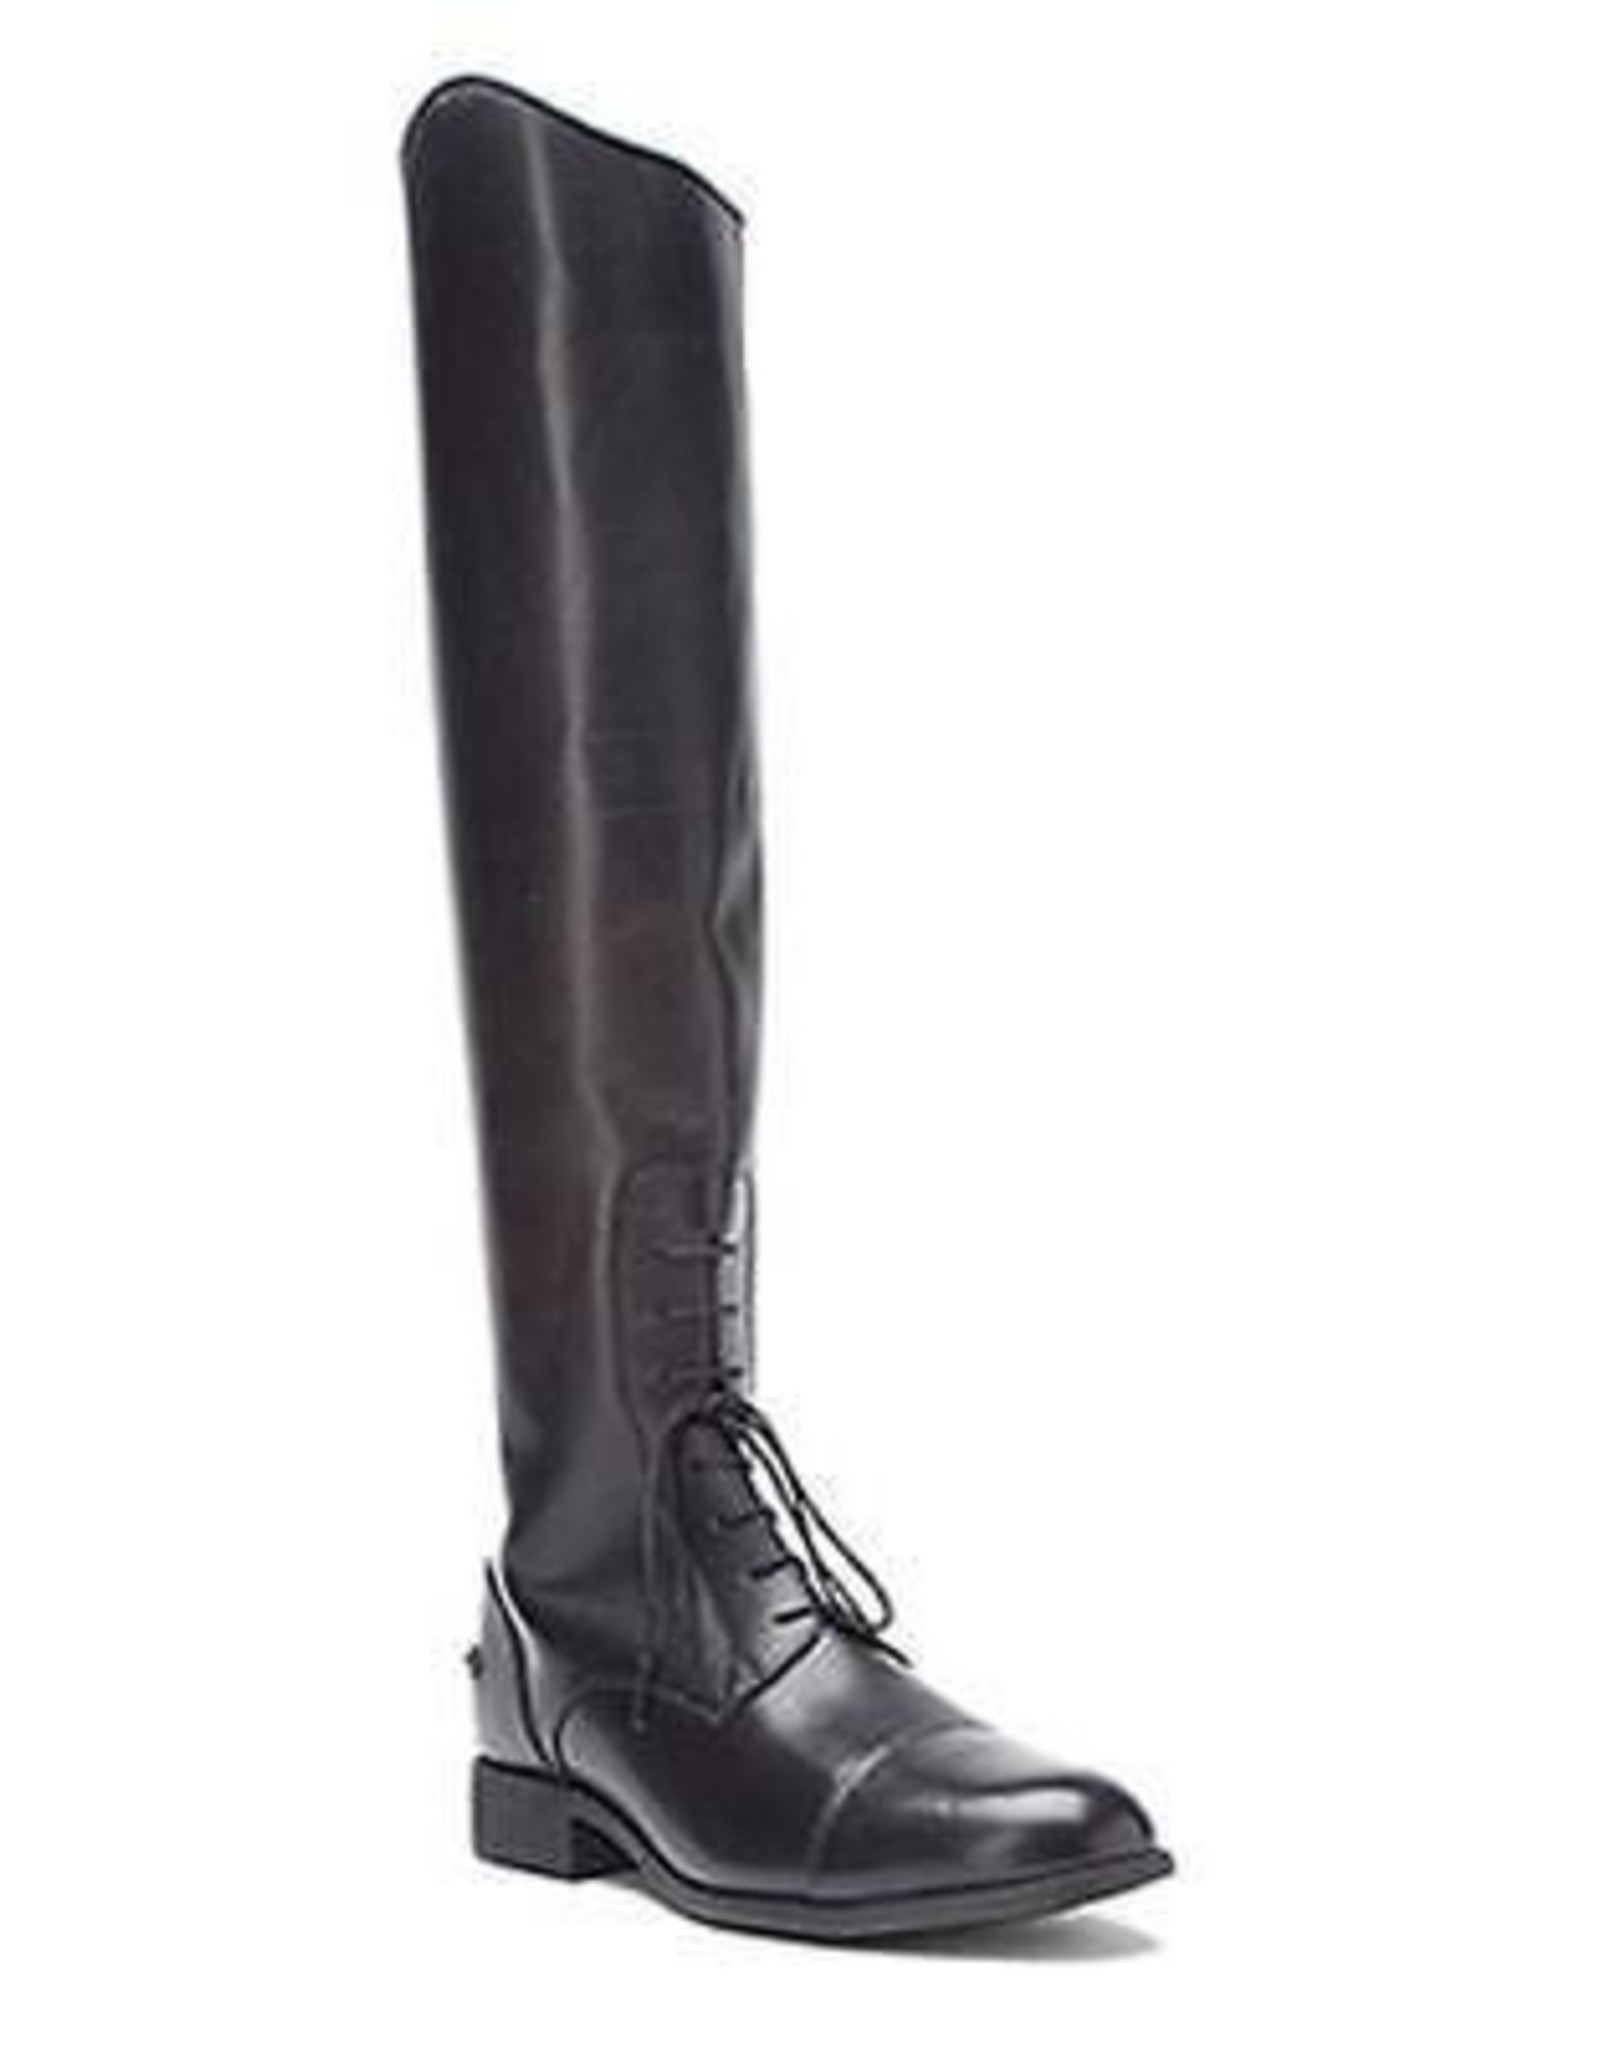 Ariat Men's Heritage Select Field Boot